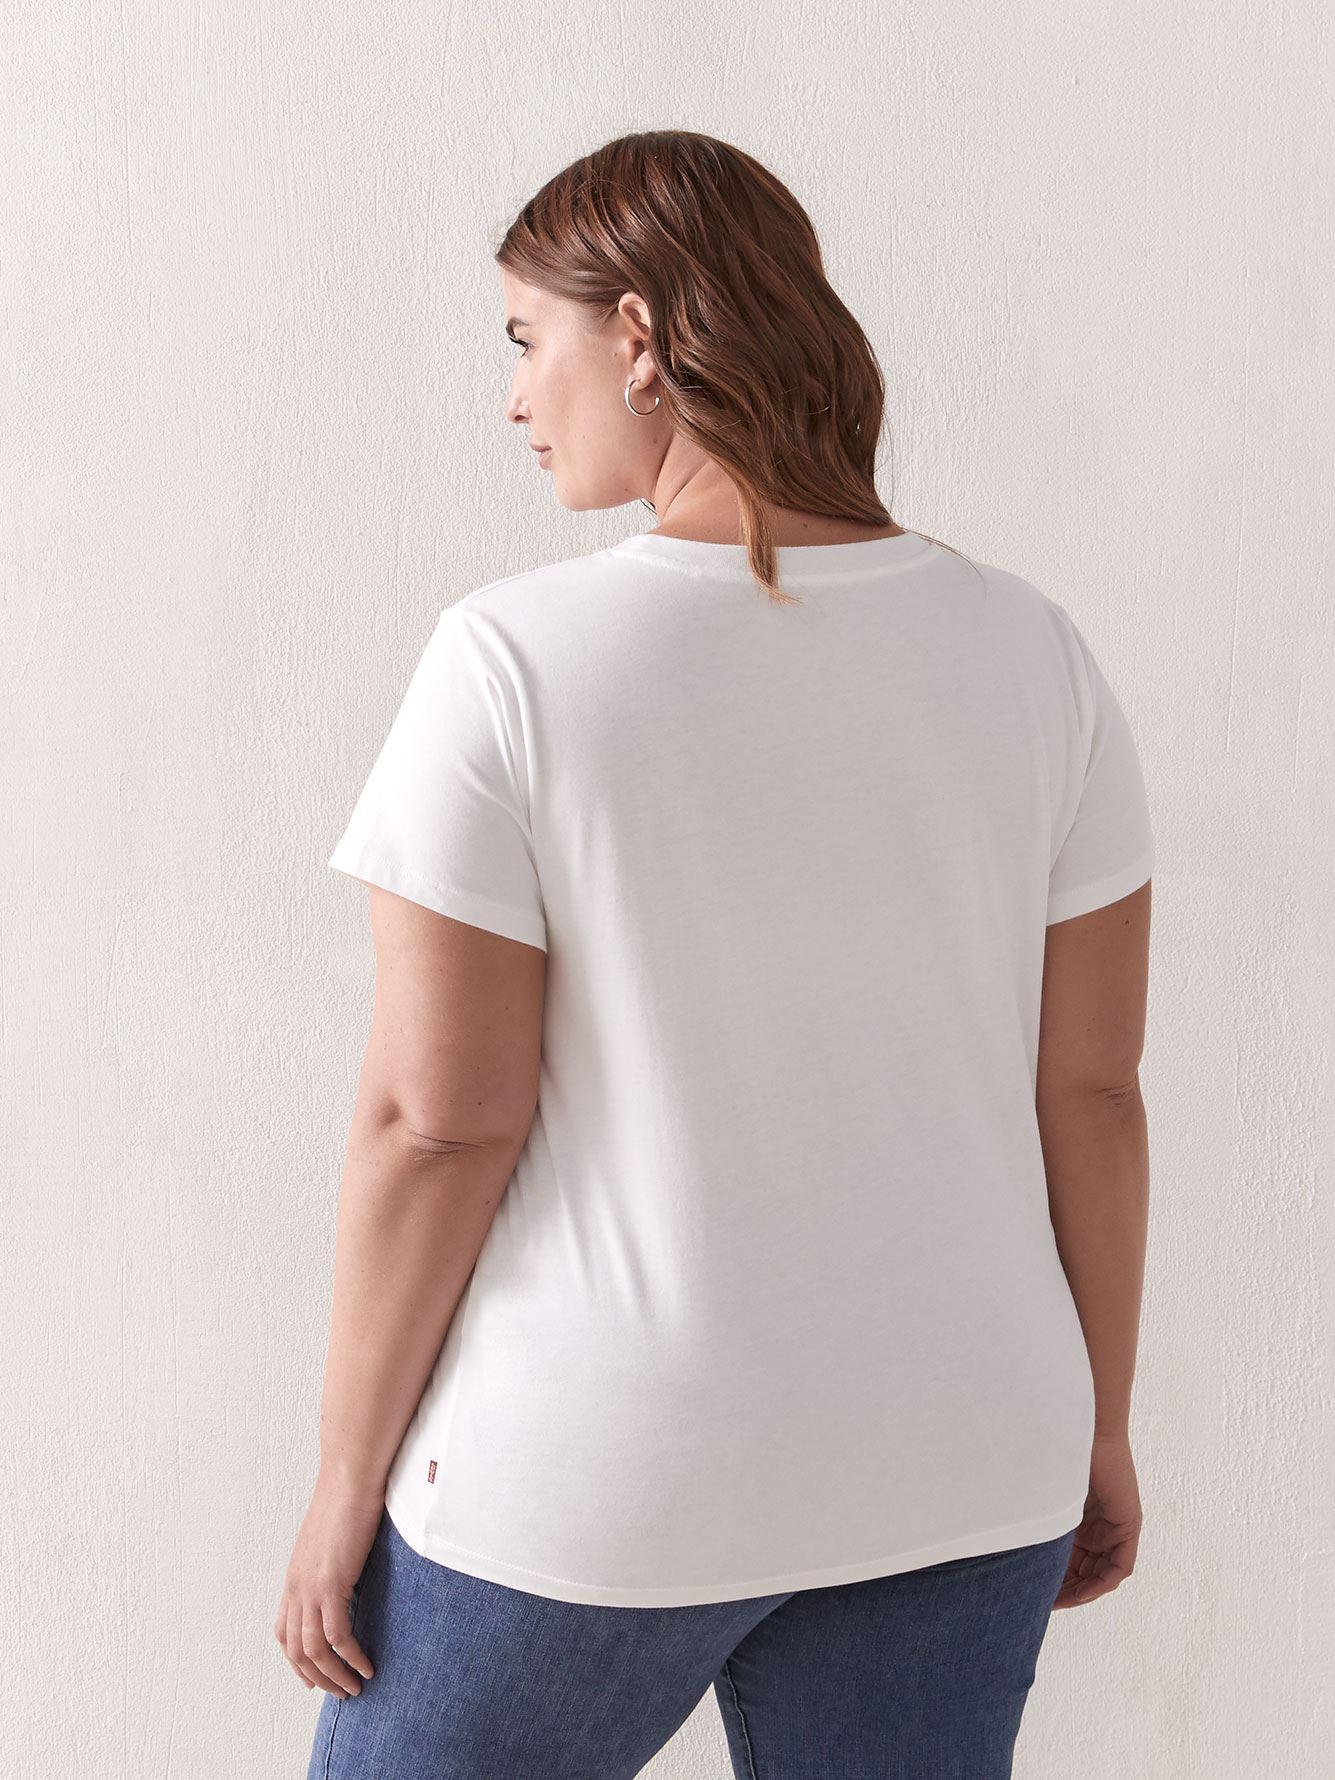 Crew-Neck Sport Logo T-Shirt - Levi's Premium